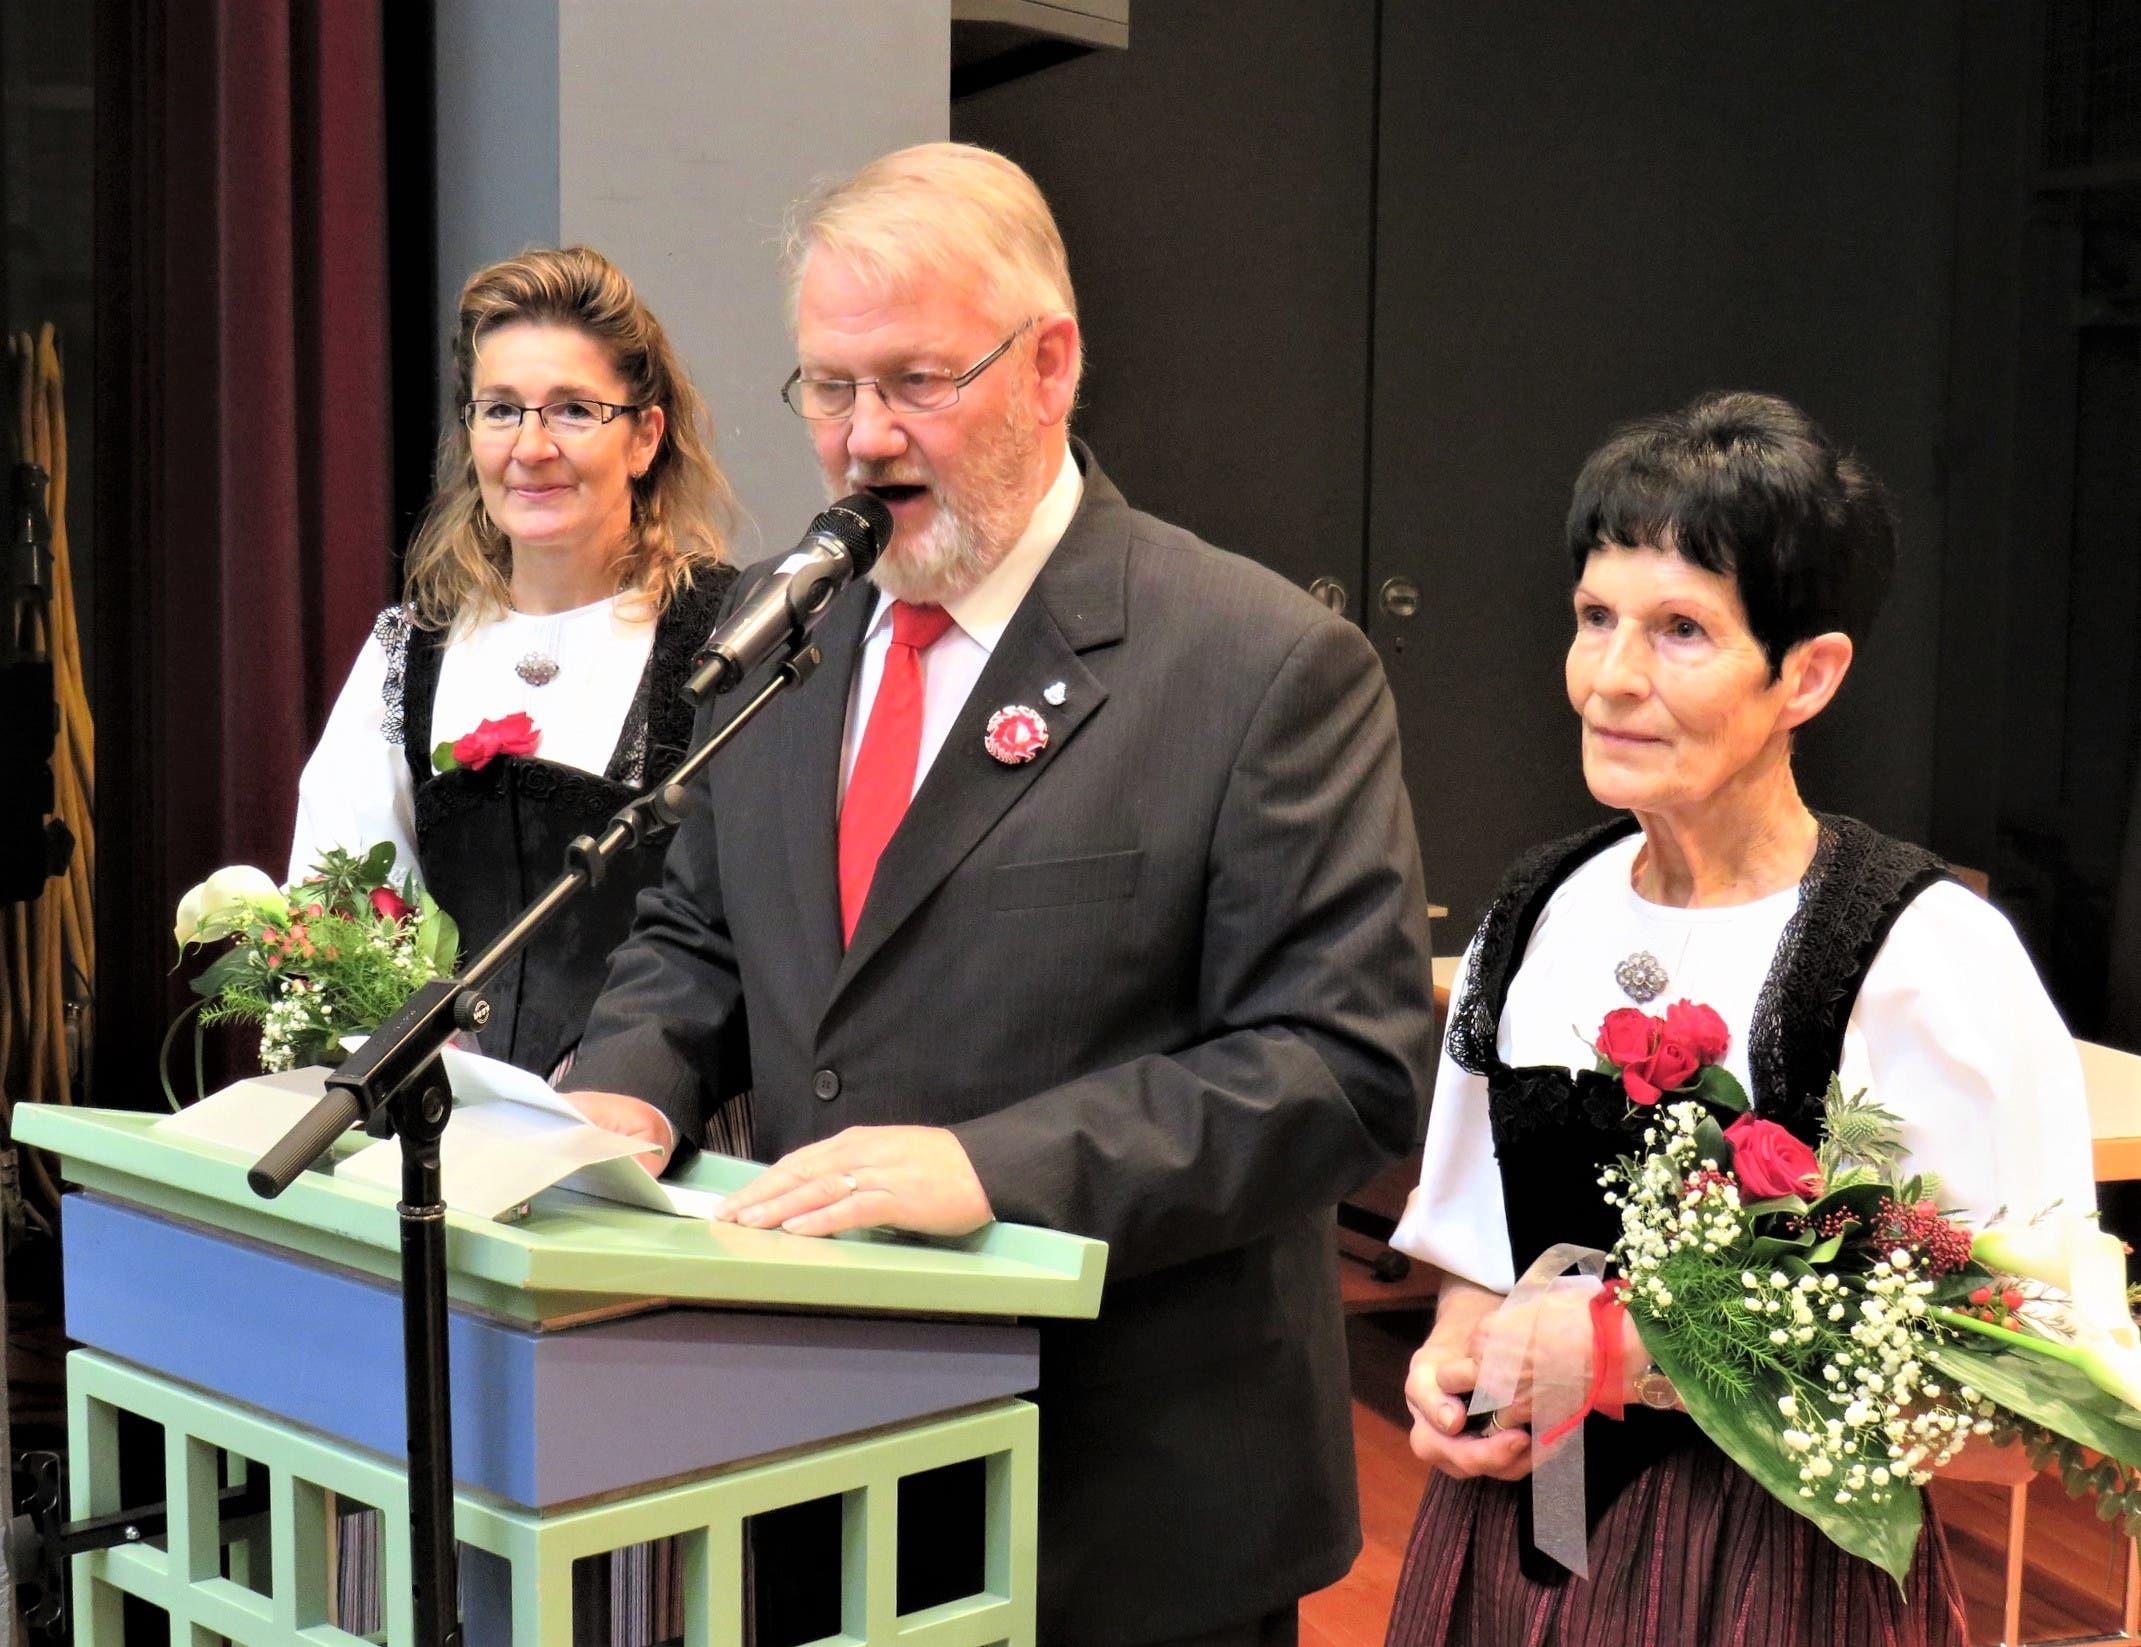 Gelungener Erstauftritt des SOSV-Präsidenten Jürg Dietschi